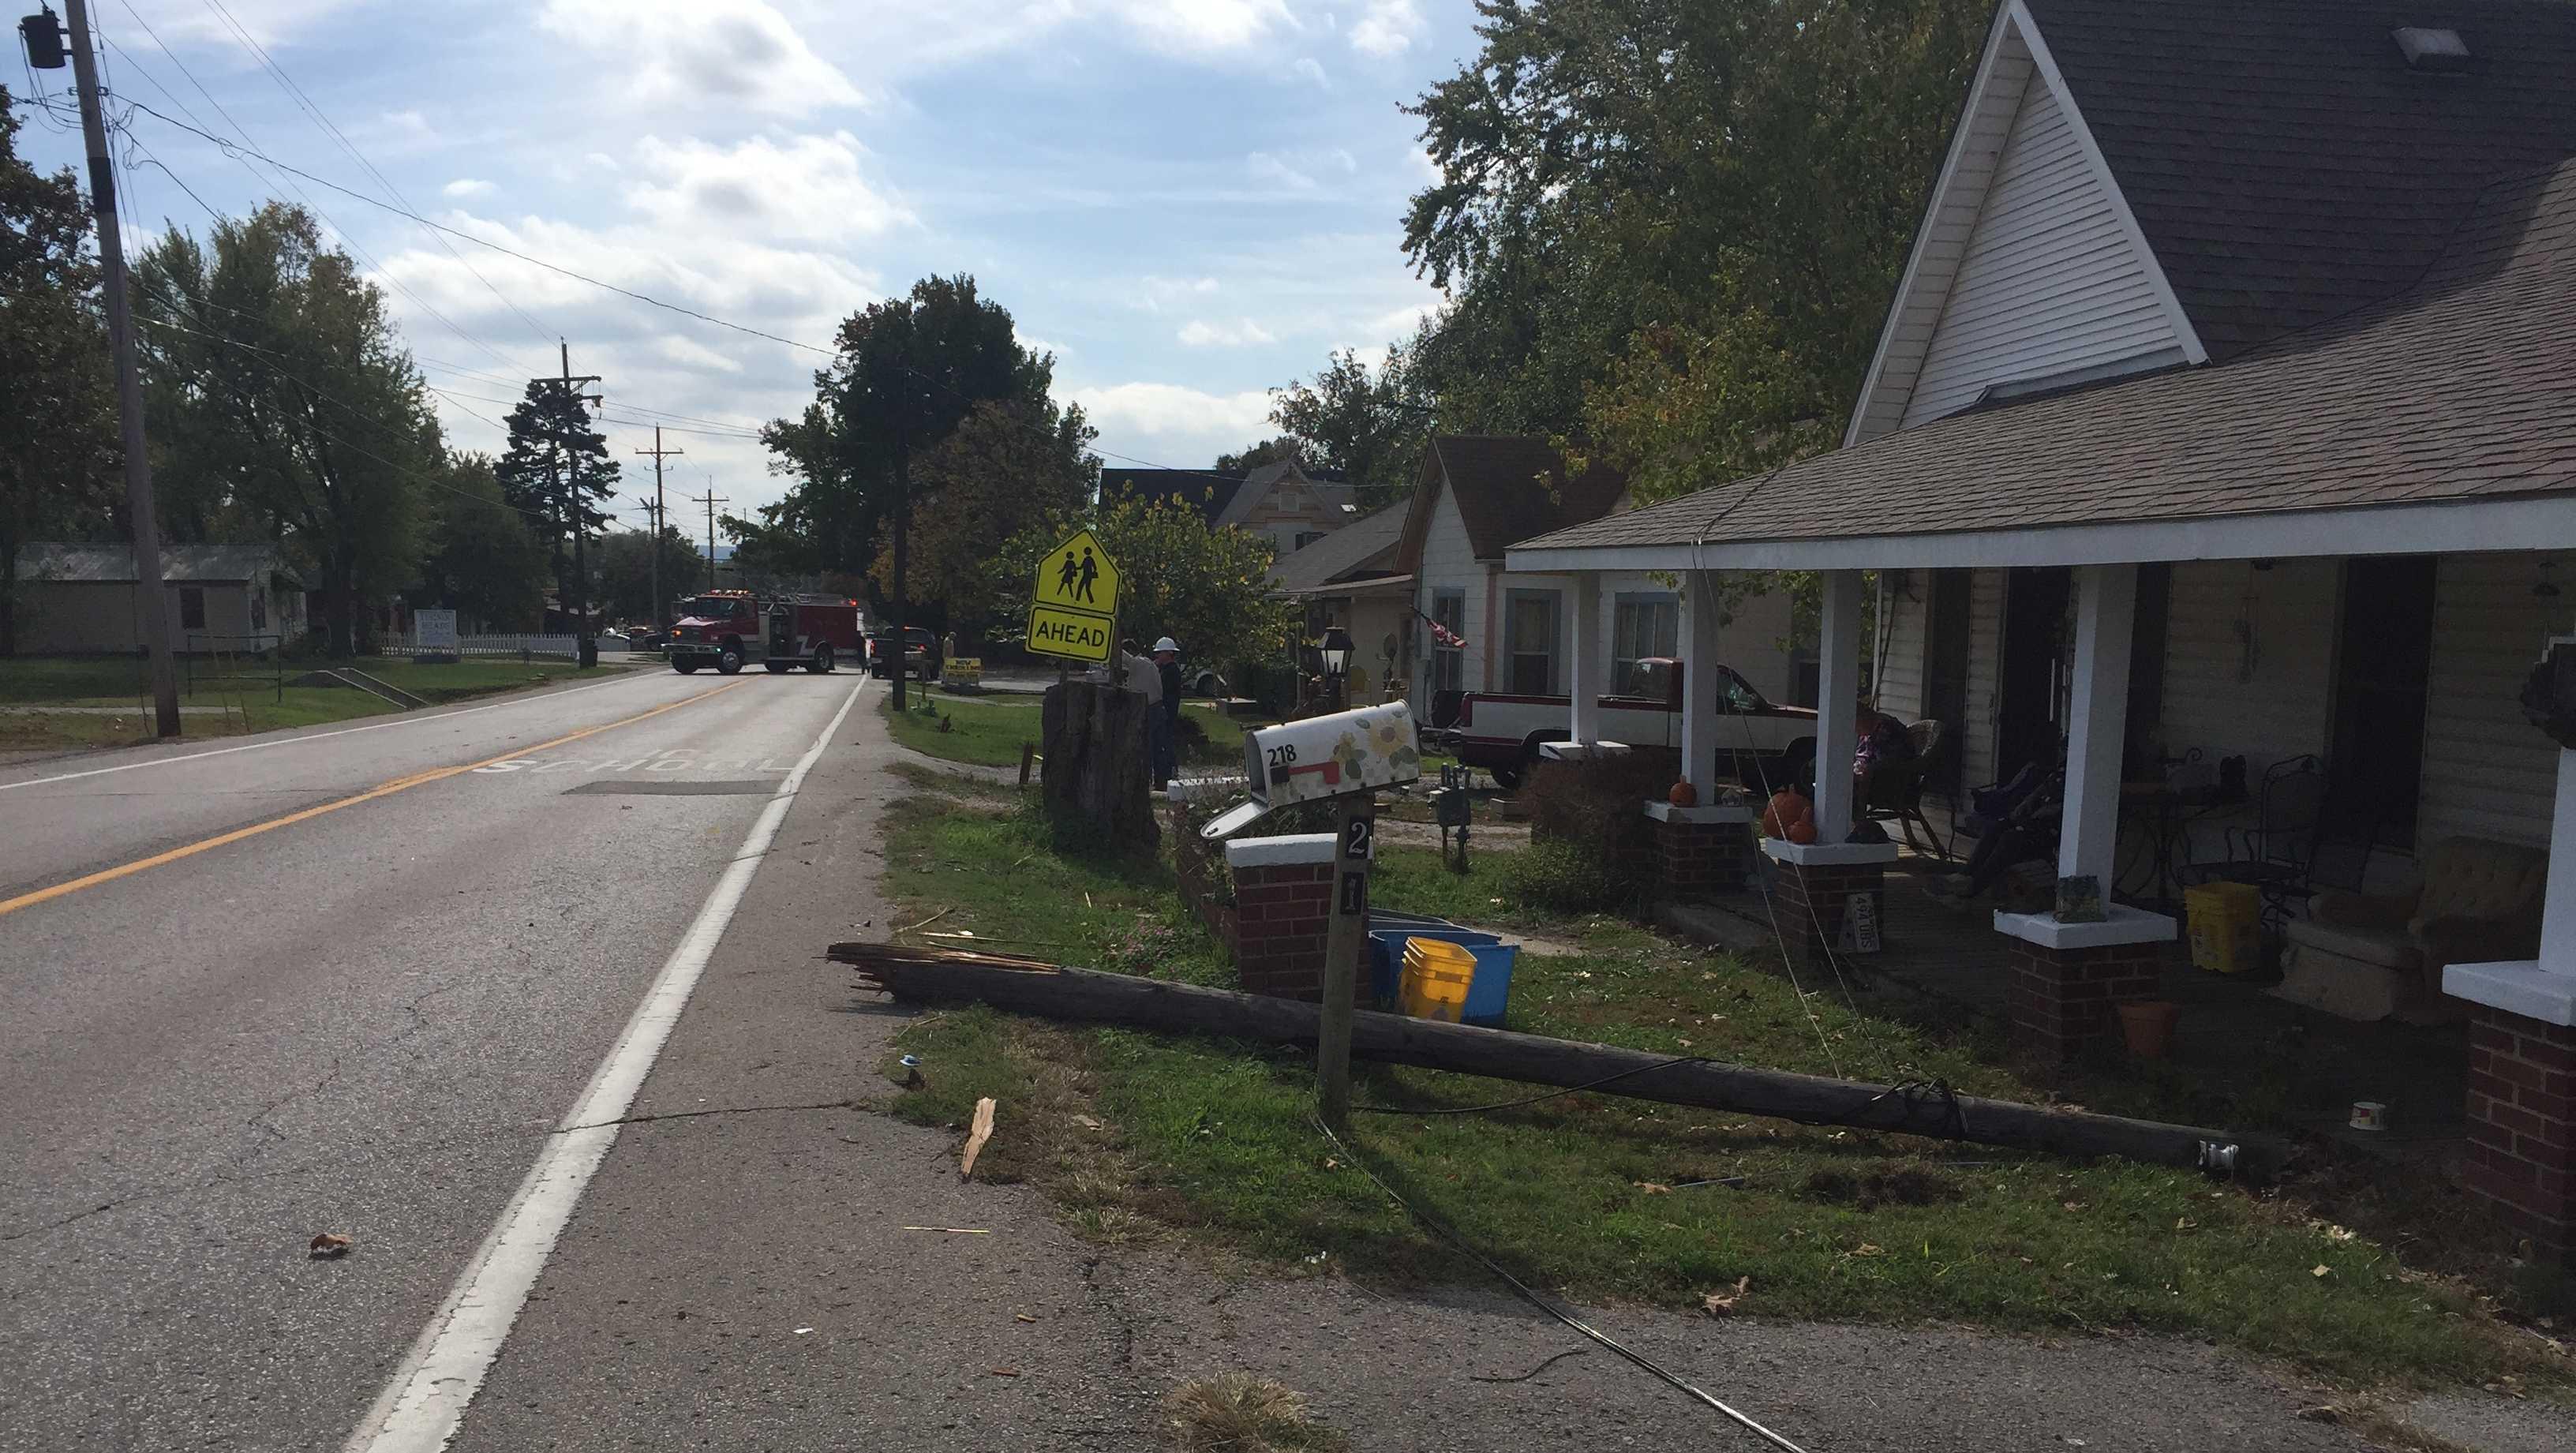 Location where a dump truck hit a power pole on Pittman St. in Prairie Grove